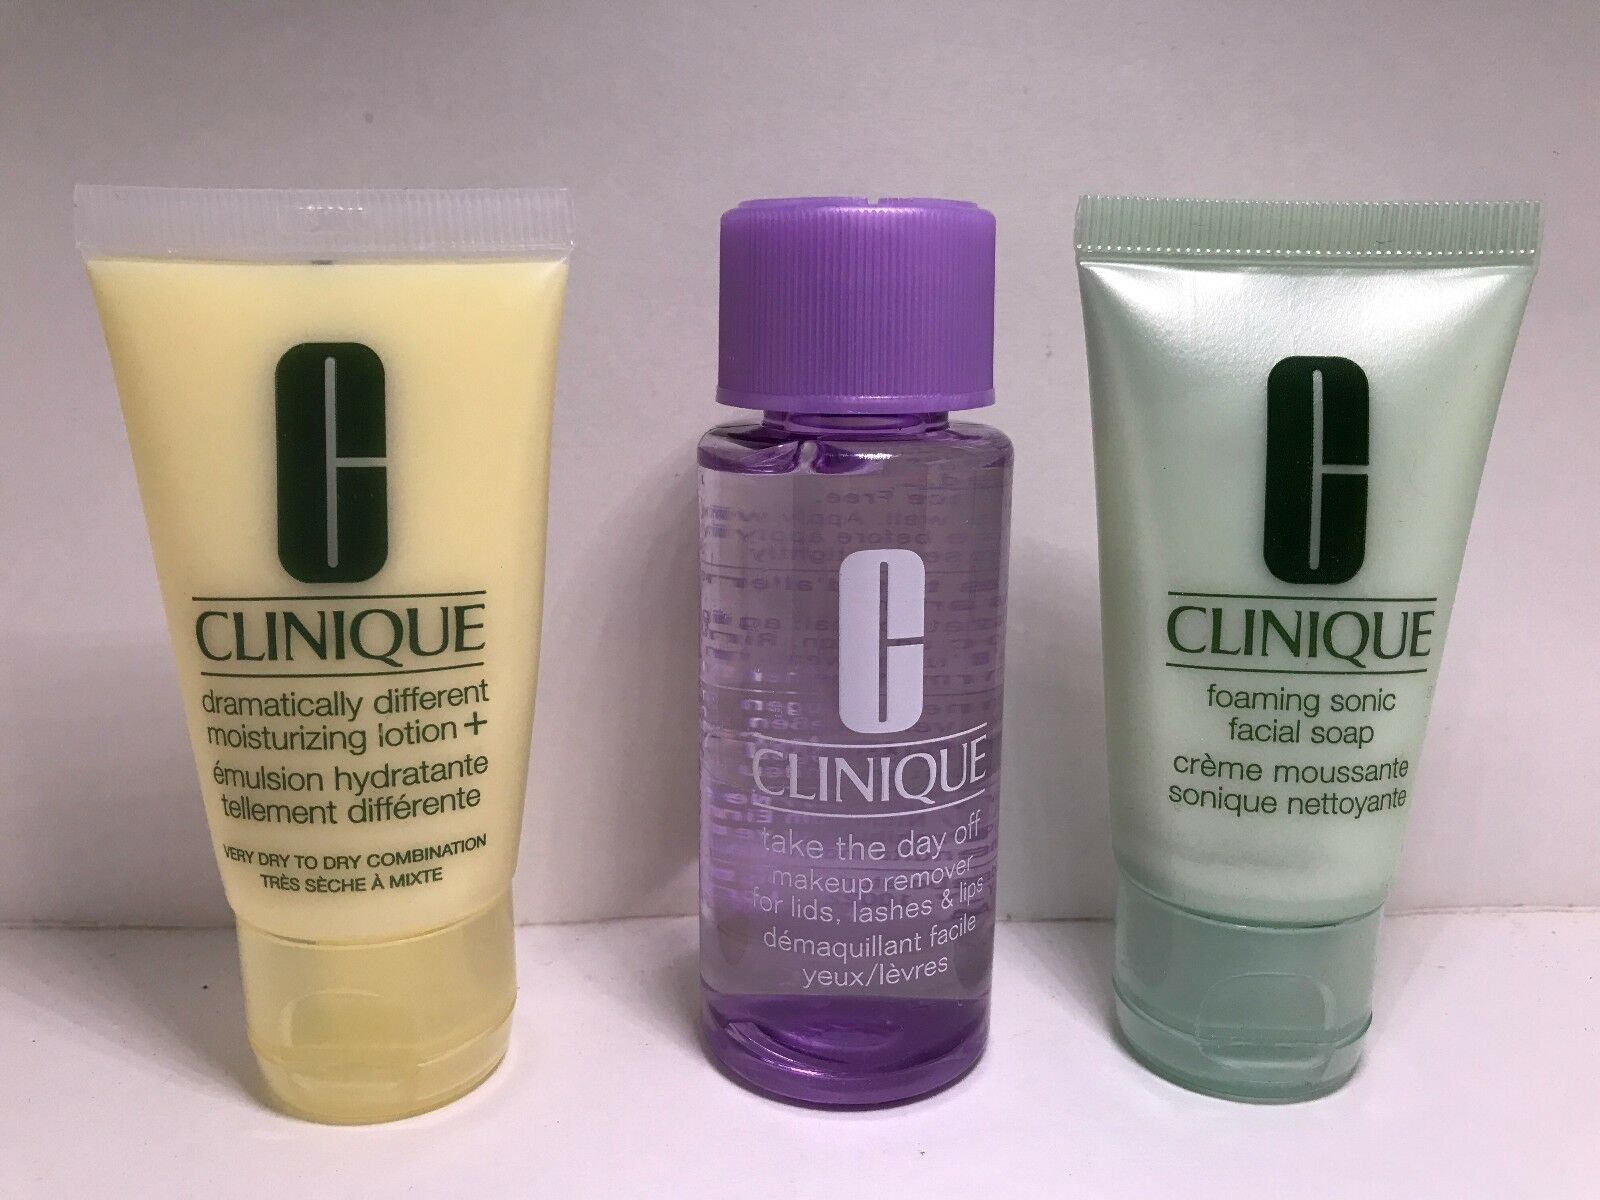 CLINIQUE 3 STEP TRAVEL SET SKINCARE KIT soap/makeup remover/